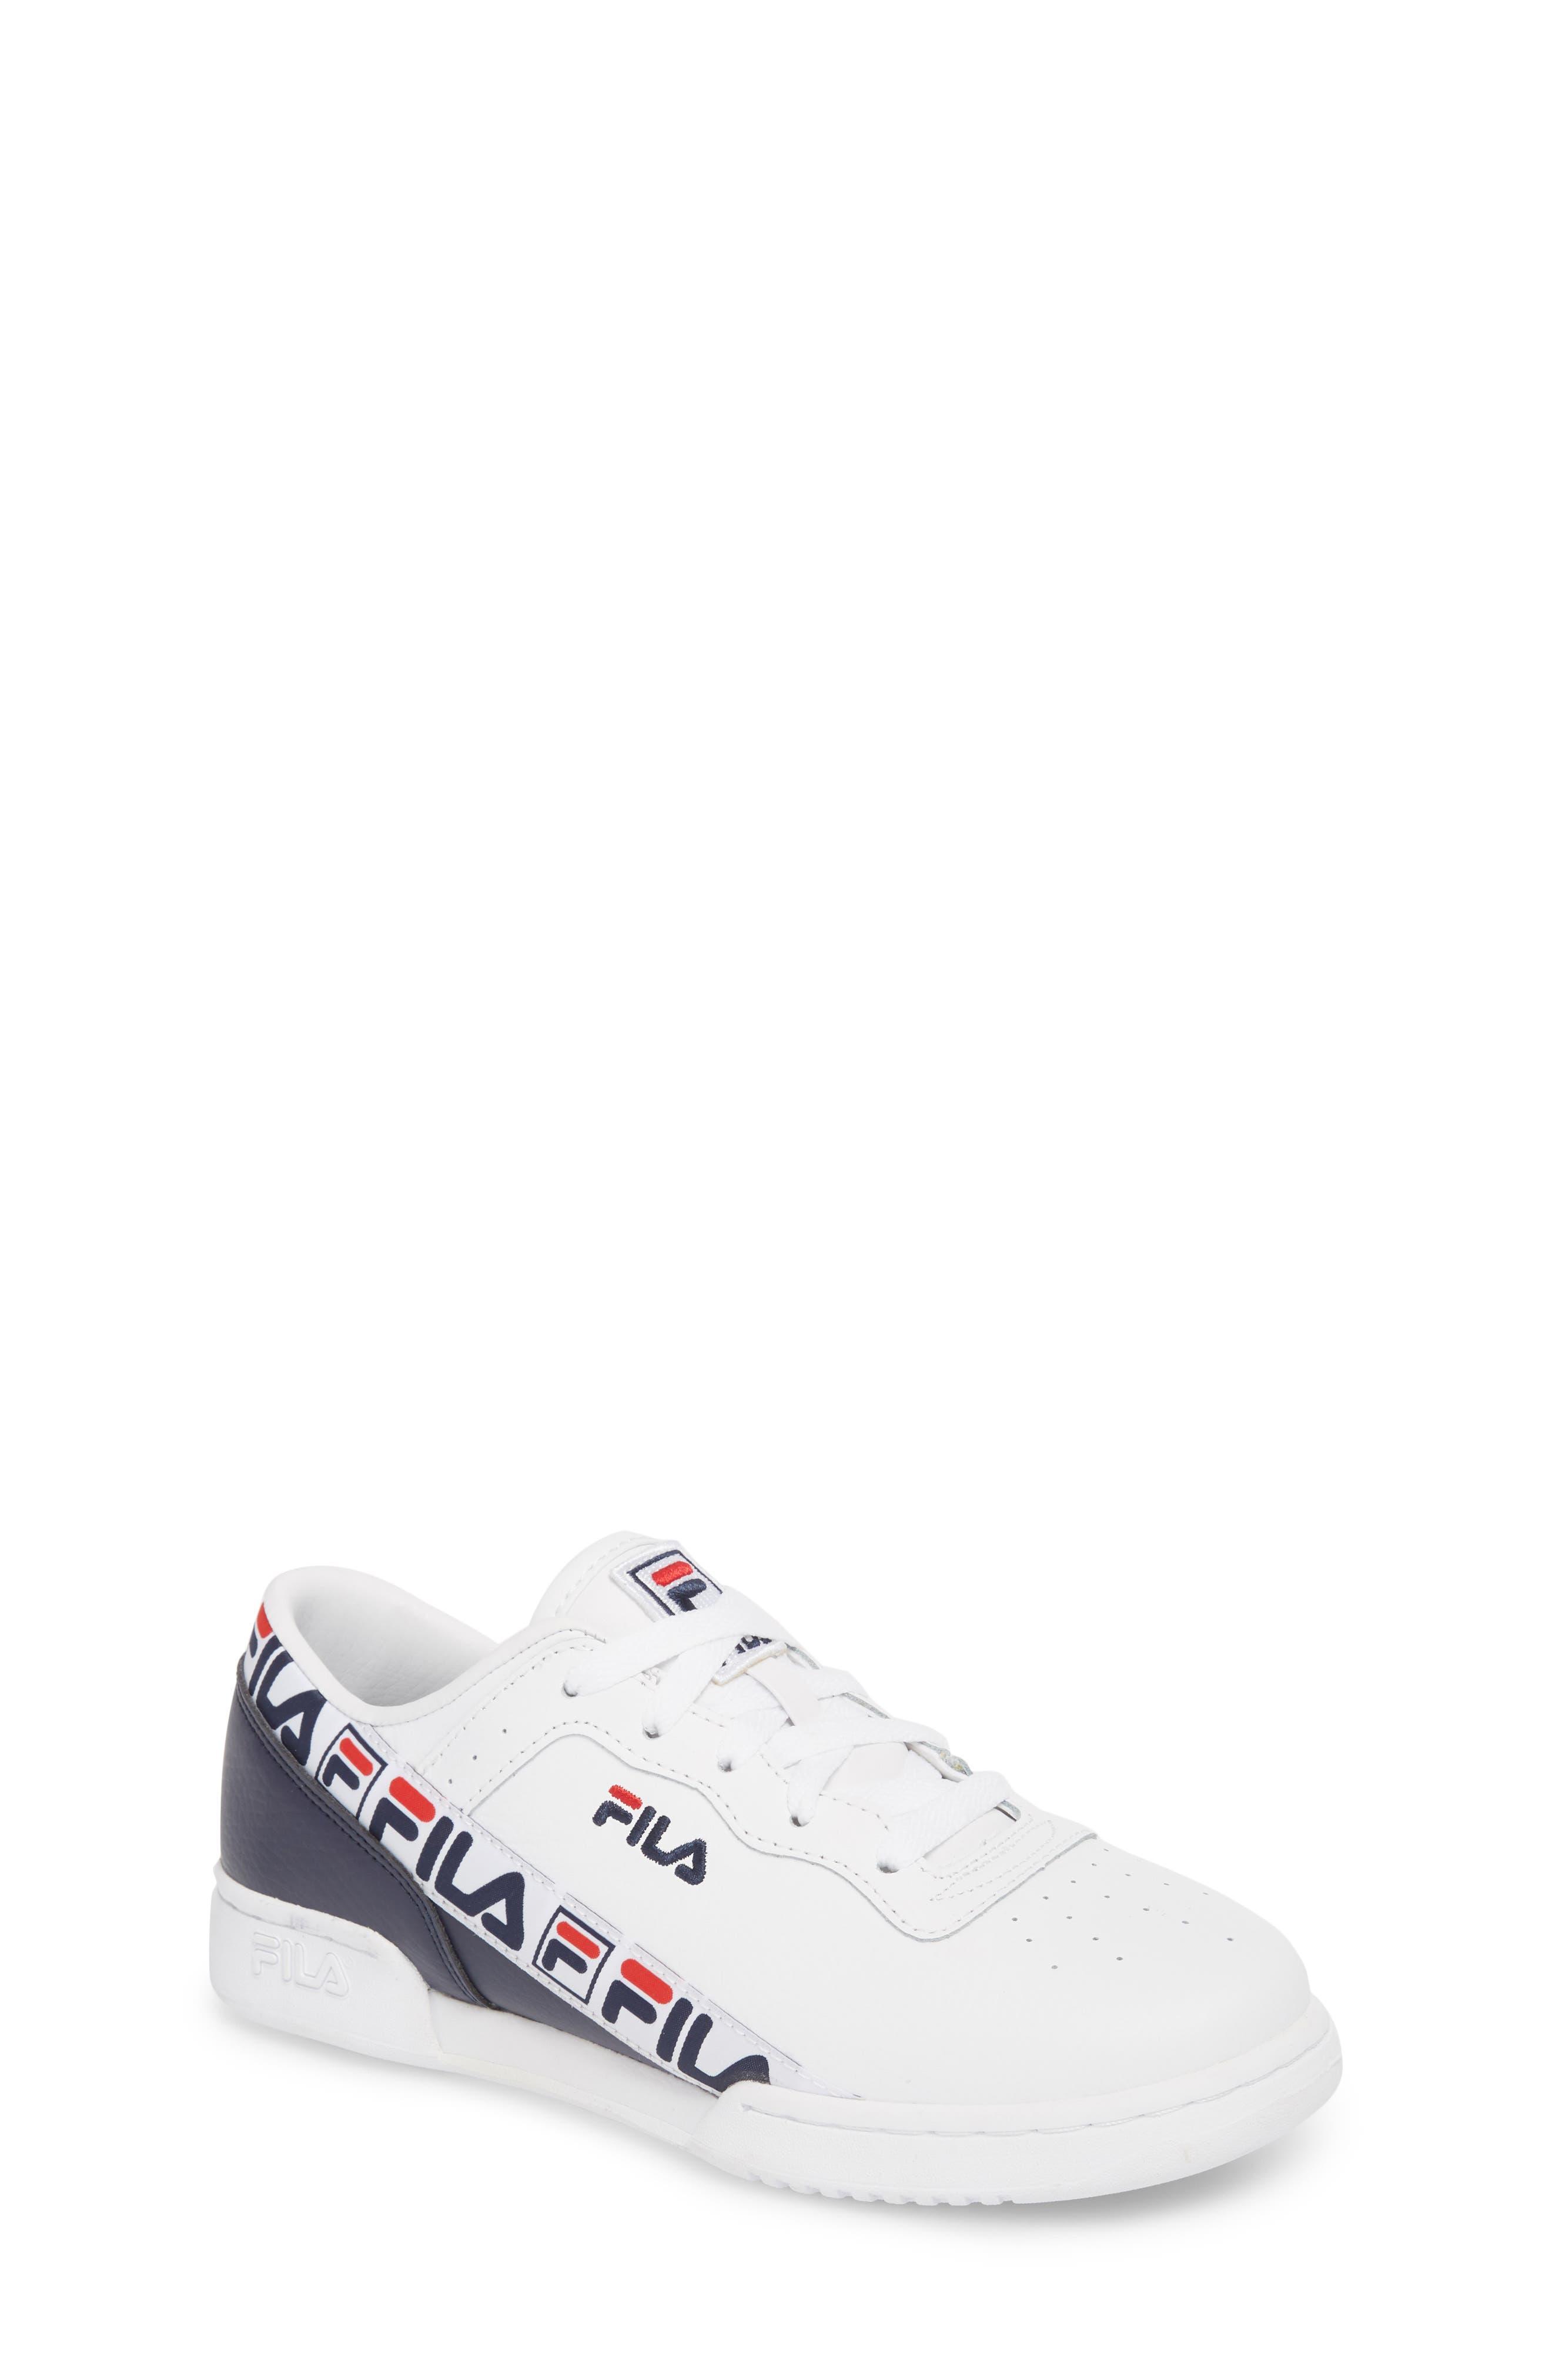 FILA Original Fitness Logo Tape Sneaker, Main, color, WHITE/ FILA NAVY